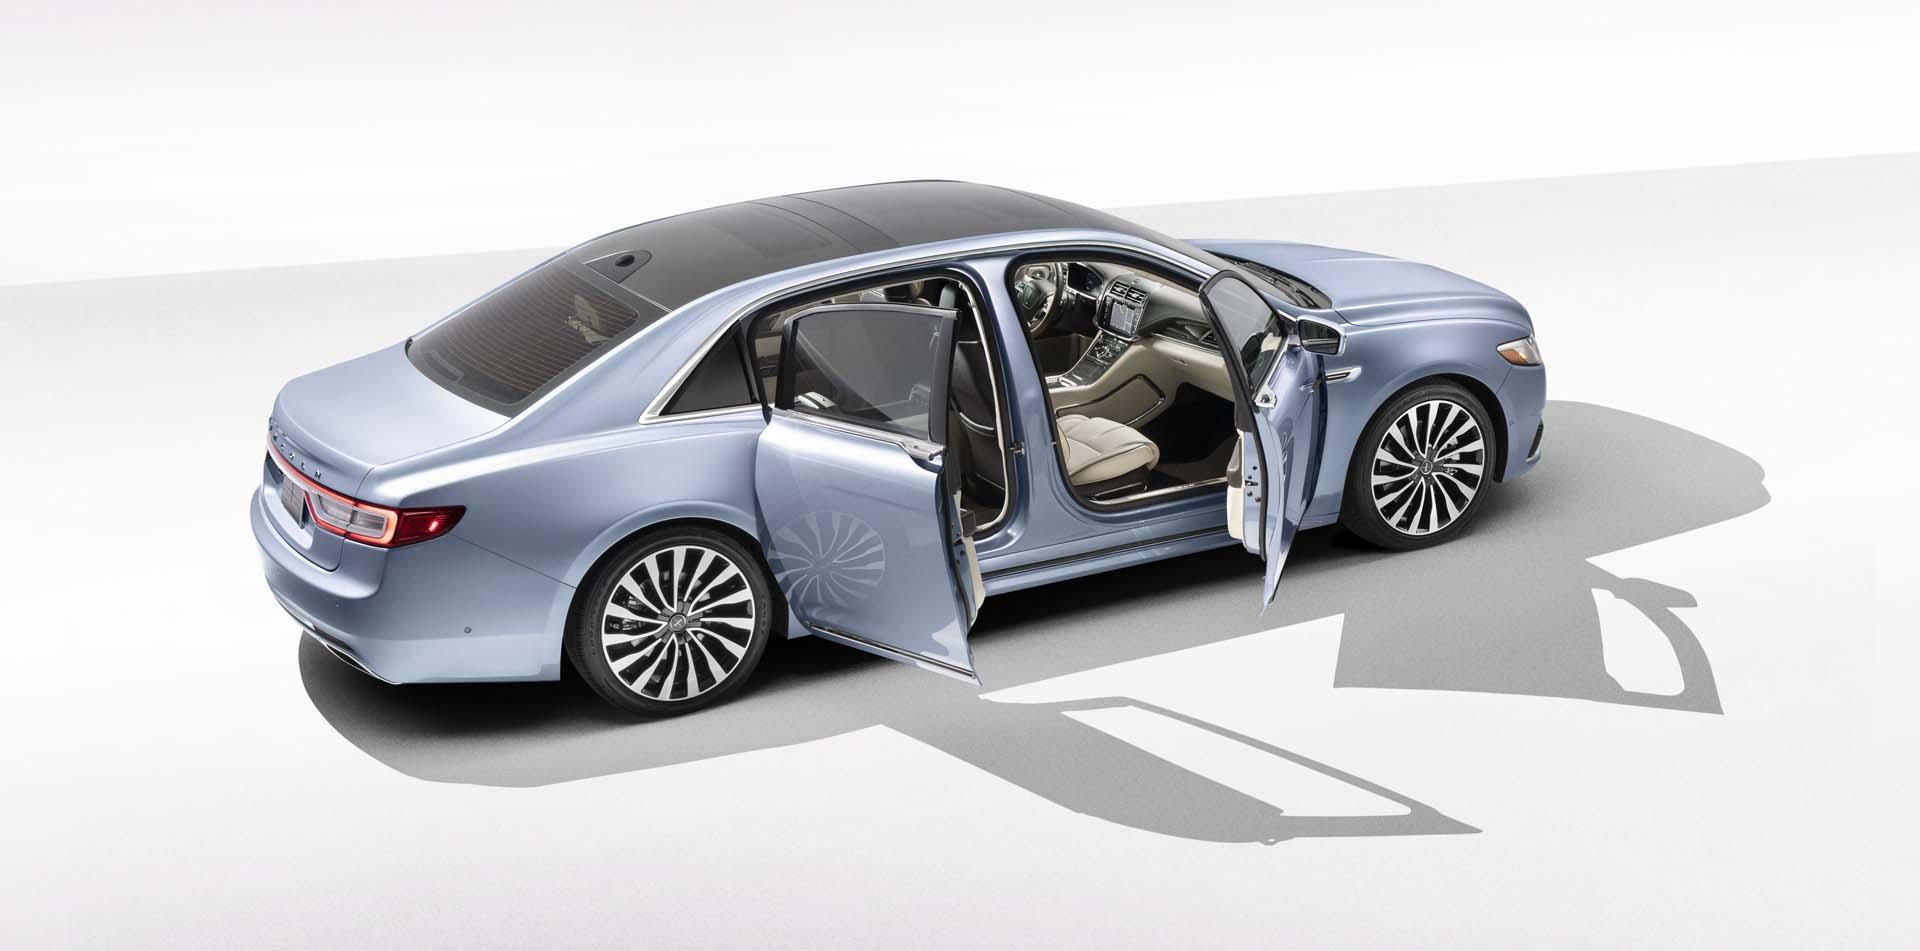 2019 Lincoln Continental, 2020 Mercedes-Benz CLA, 2020 VW ID Neo: Car News Headlines